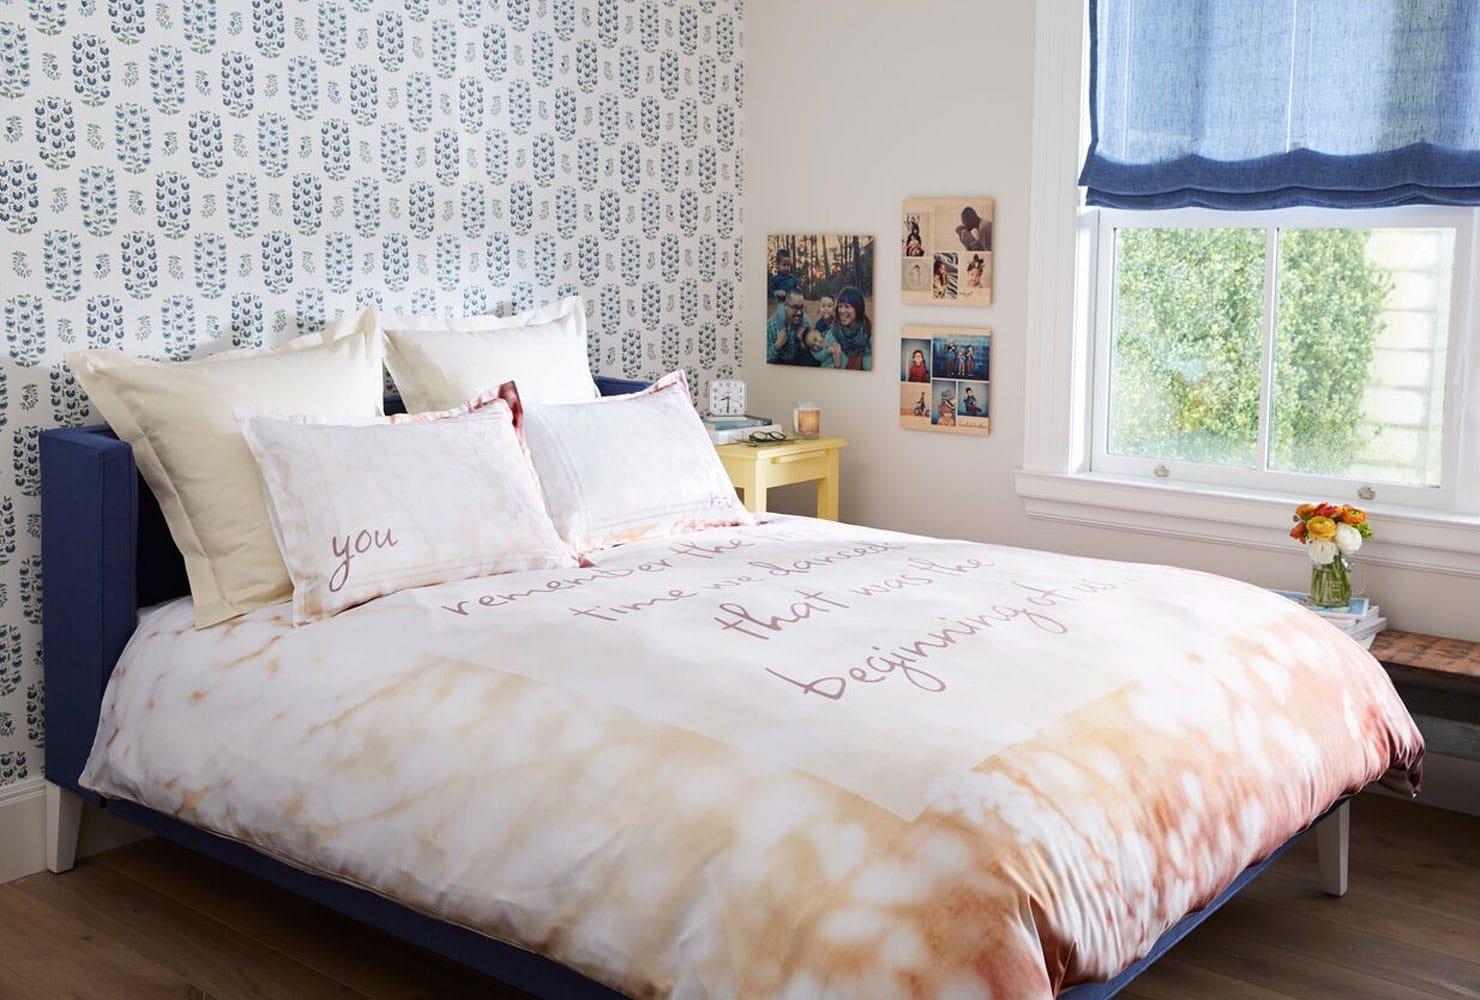 Diy Decor Ideas for Bedroom Elegant 24 Diy Bedroom Decor Ideas to Inspire You with Printables